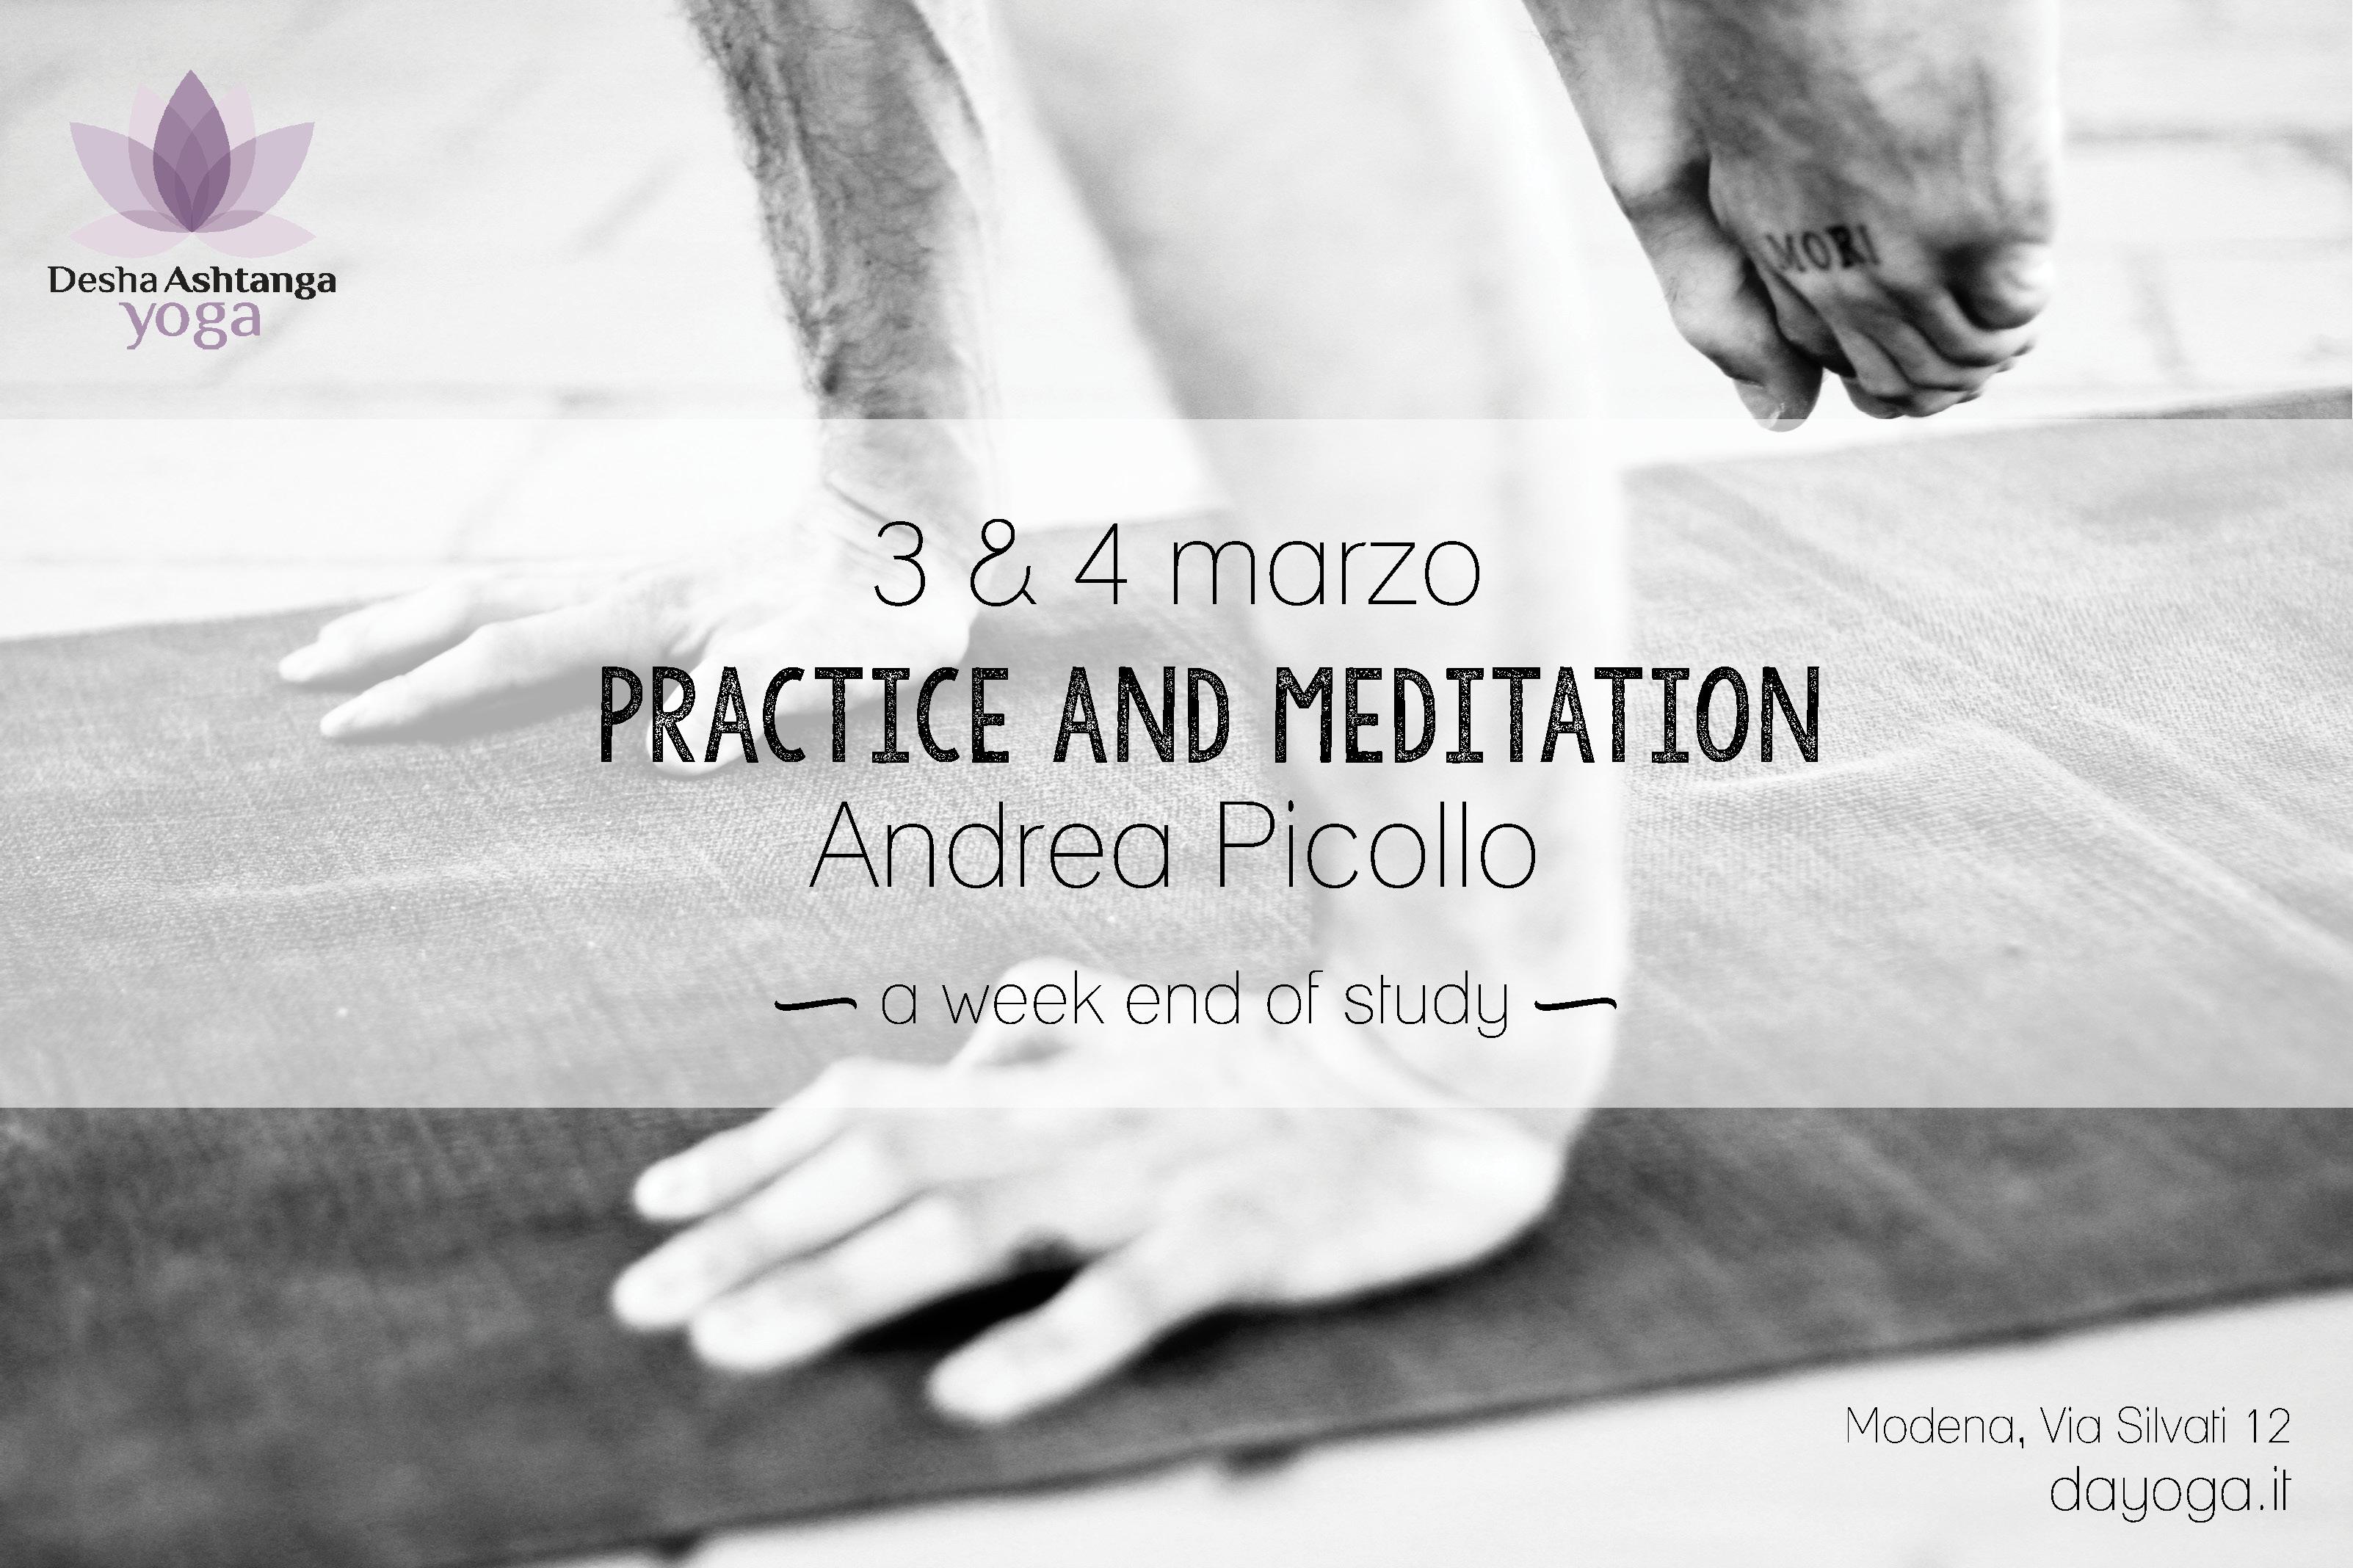 Andrea Picollo Desha Ashtanga Yoga